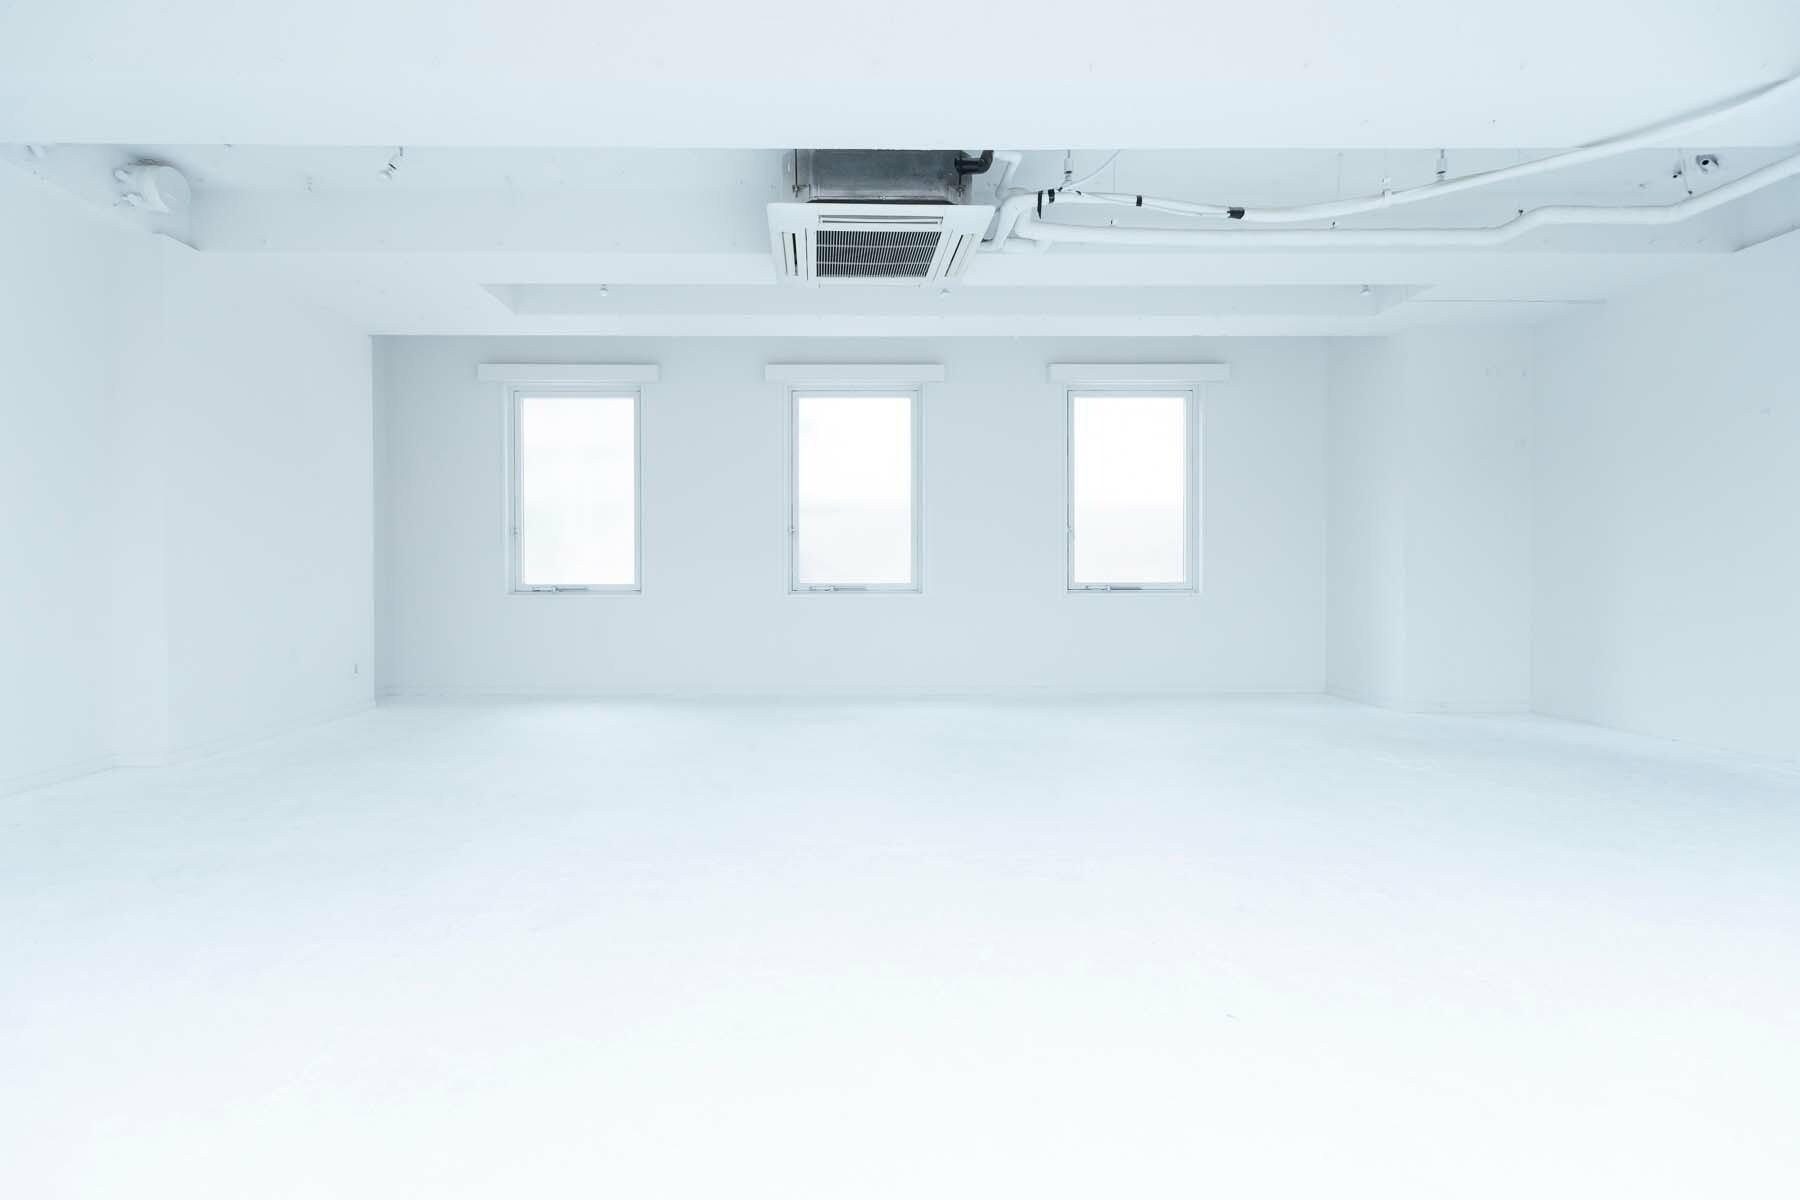 STUDIO FLOD 2F (スタジオフロード2F)white